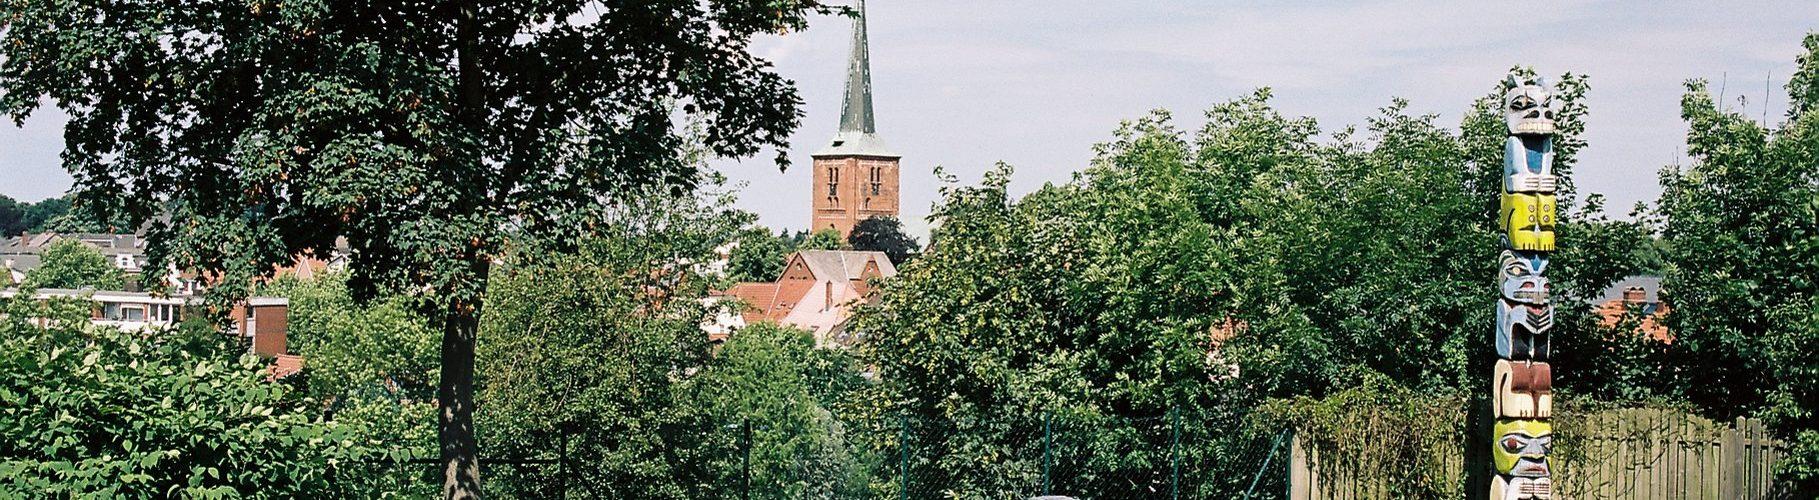 Bad Segeberg   © weites.land